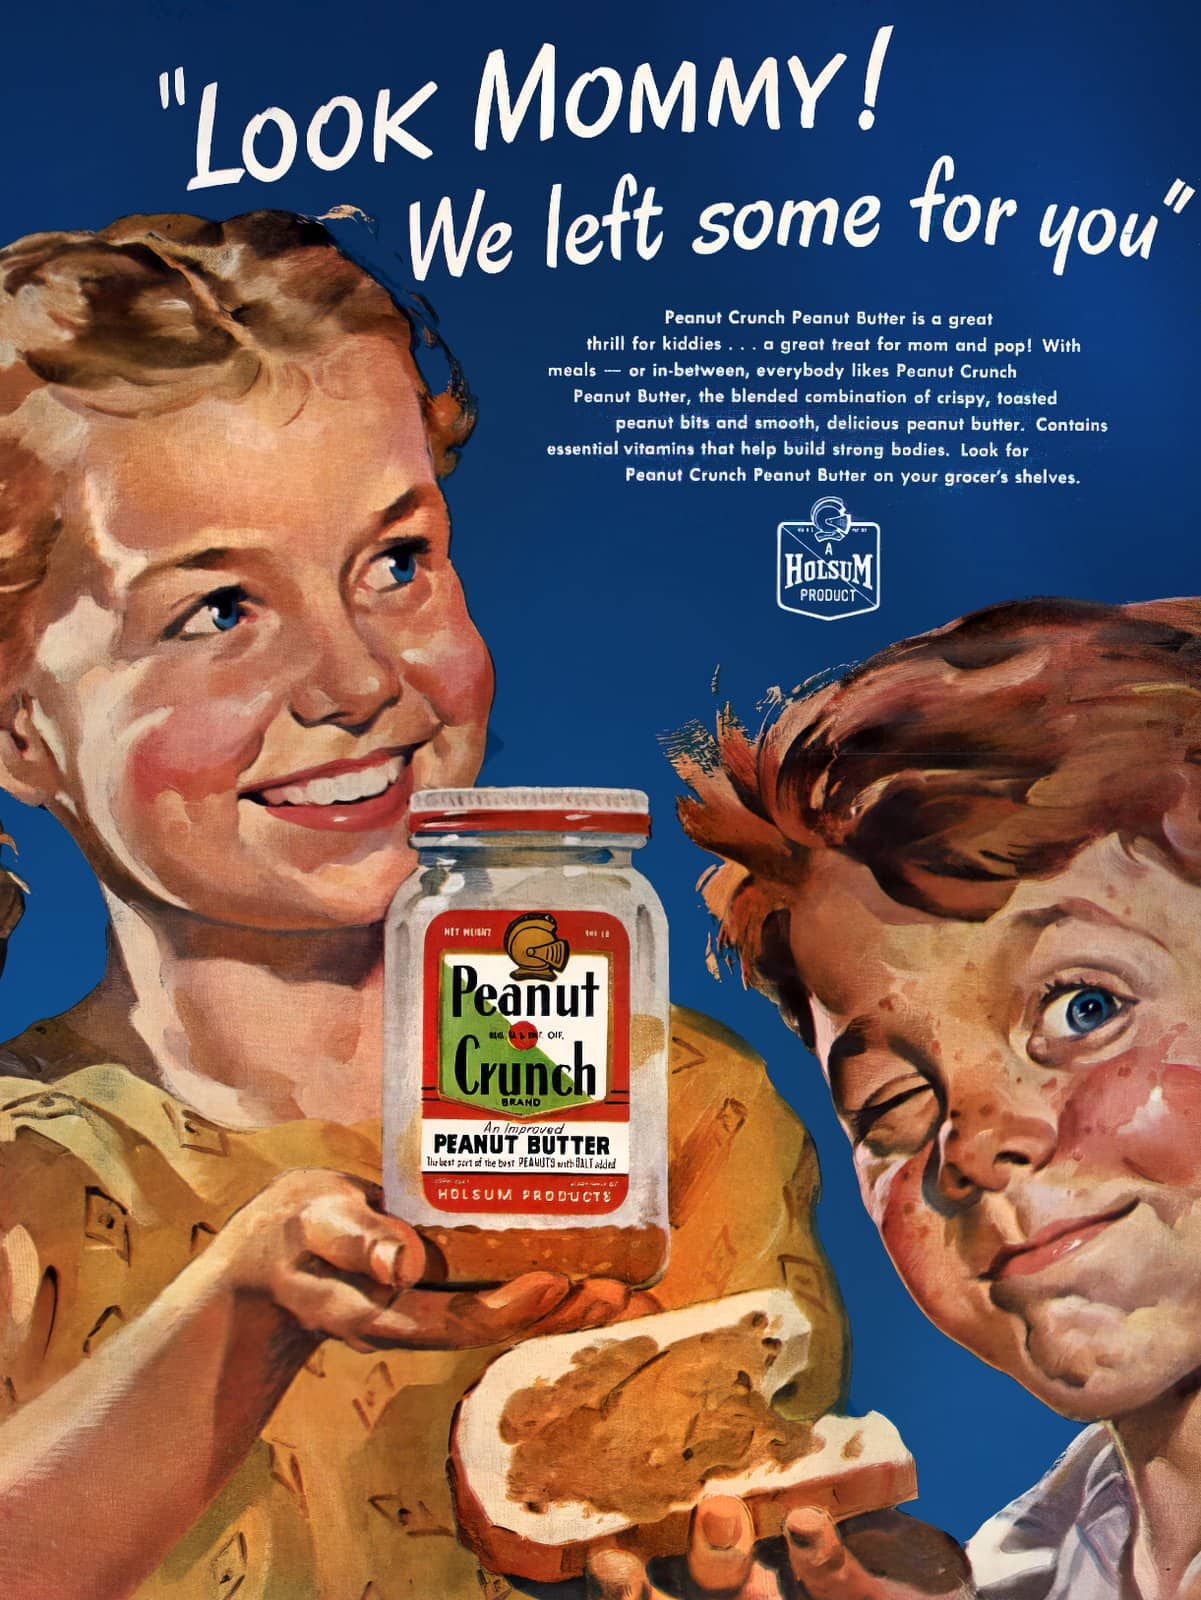 Vintage Holsum Peanut Crunch peanut butter (1950s)